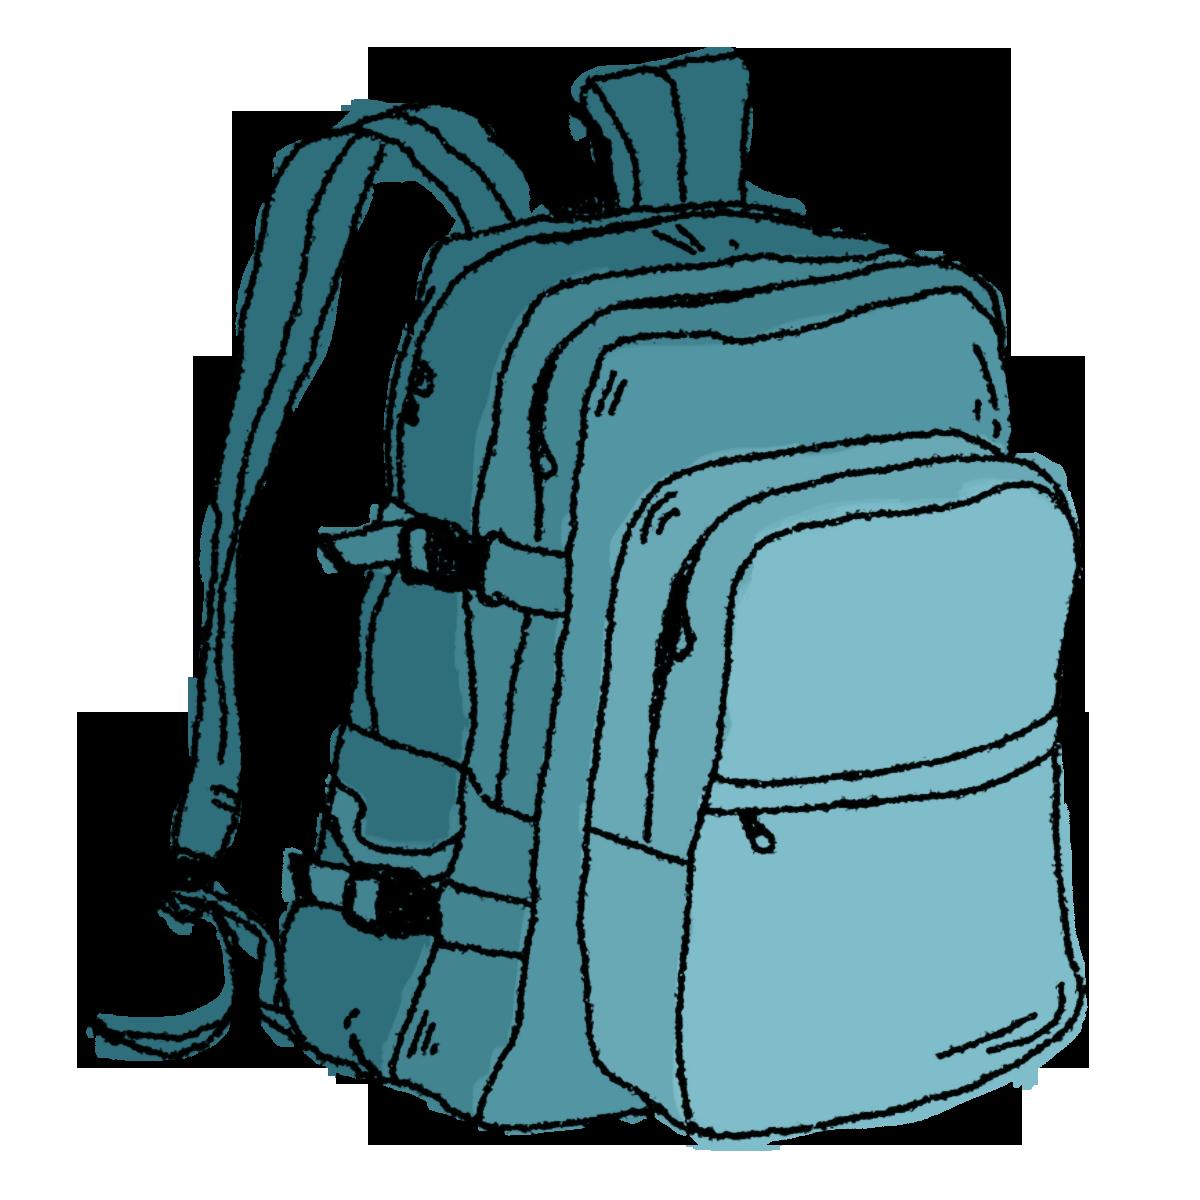 Bookbag Clipart.